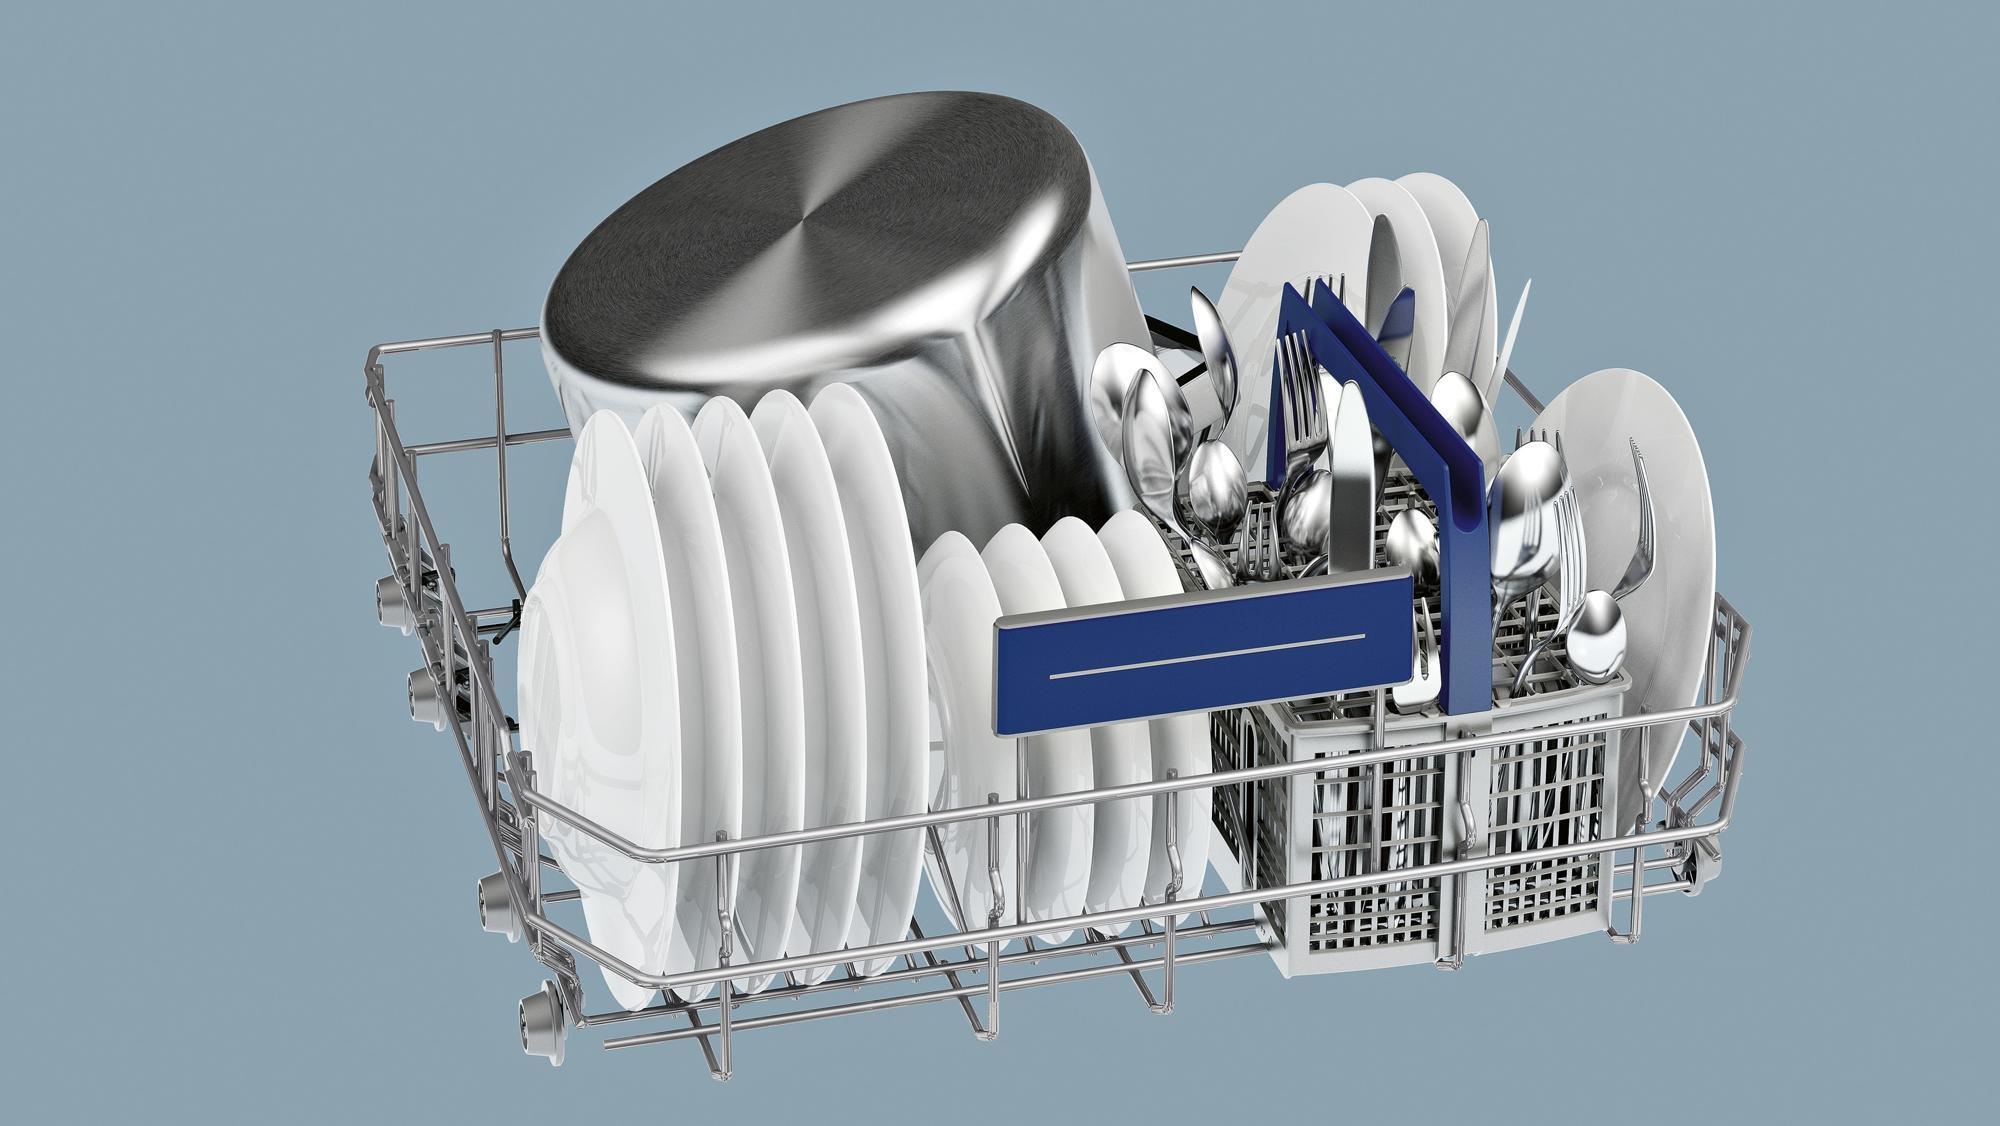 Siemens Kühlschrank 70 Cm Breit : Siemens sn s ie a integrierbarer geschirrspüler cm breit